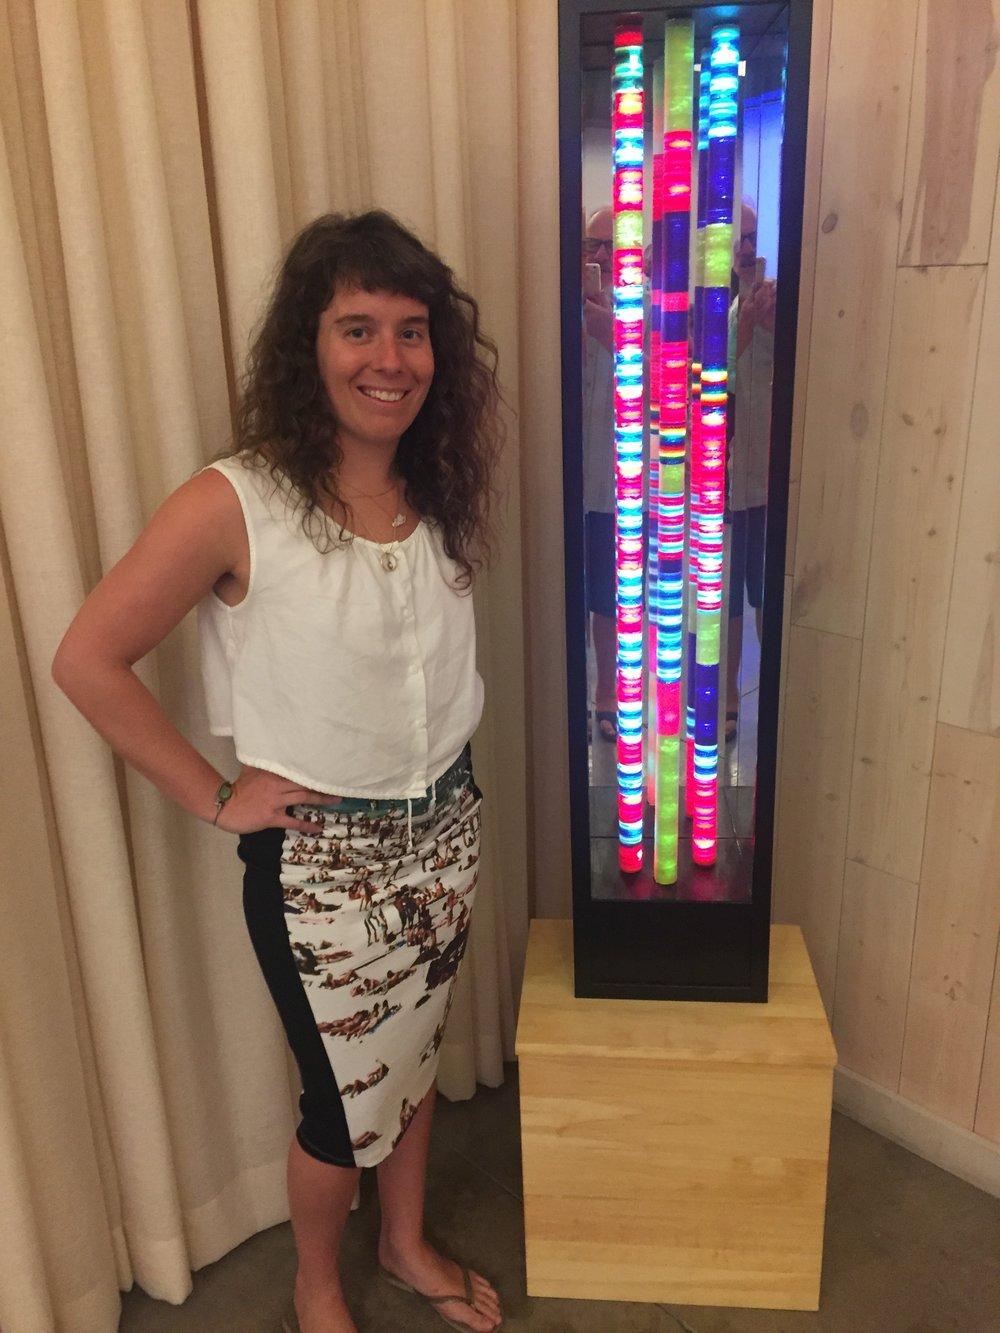 Compass Art Consulting Art Pop-Up 2017 Hallie Rae Ward.JPG